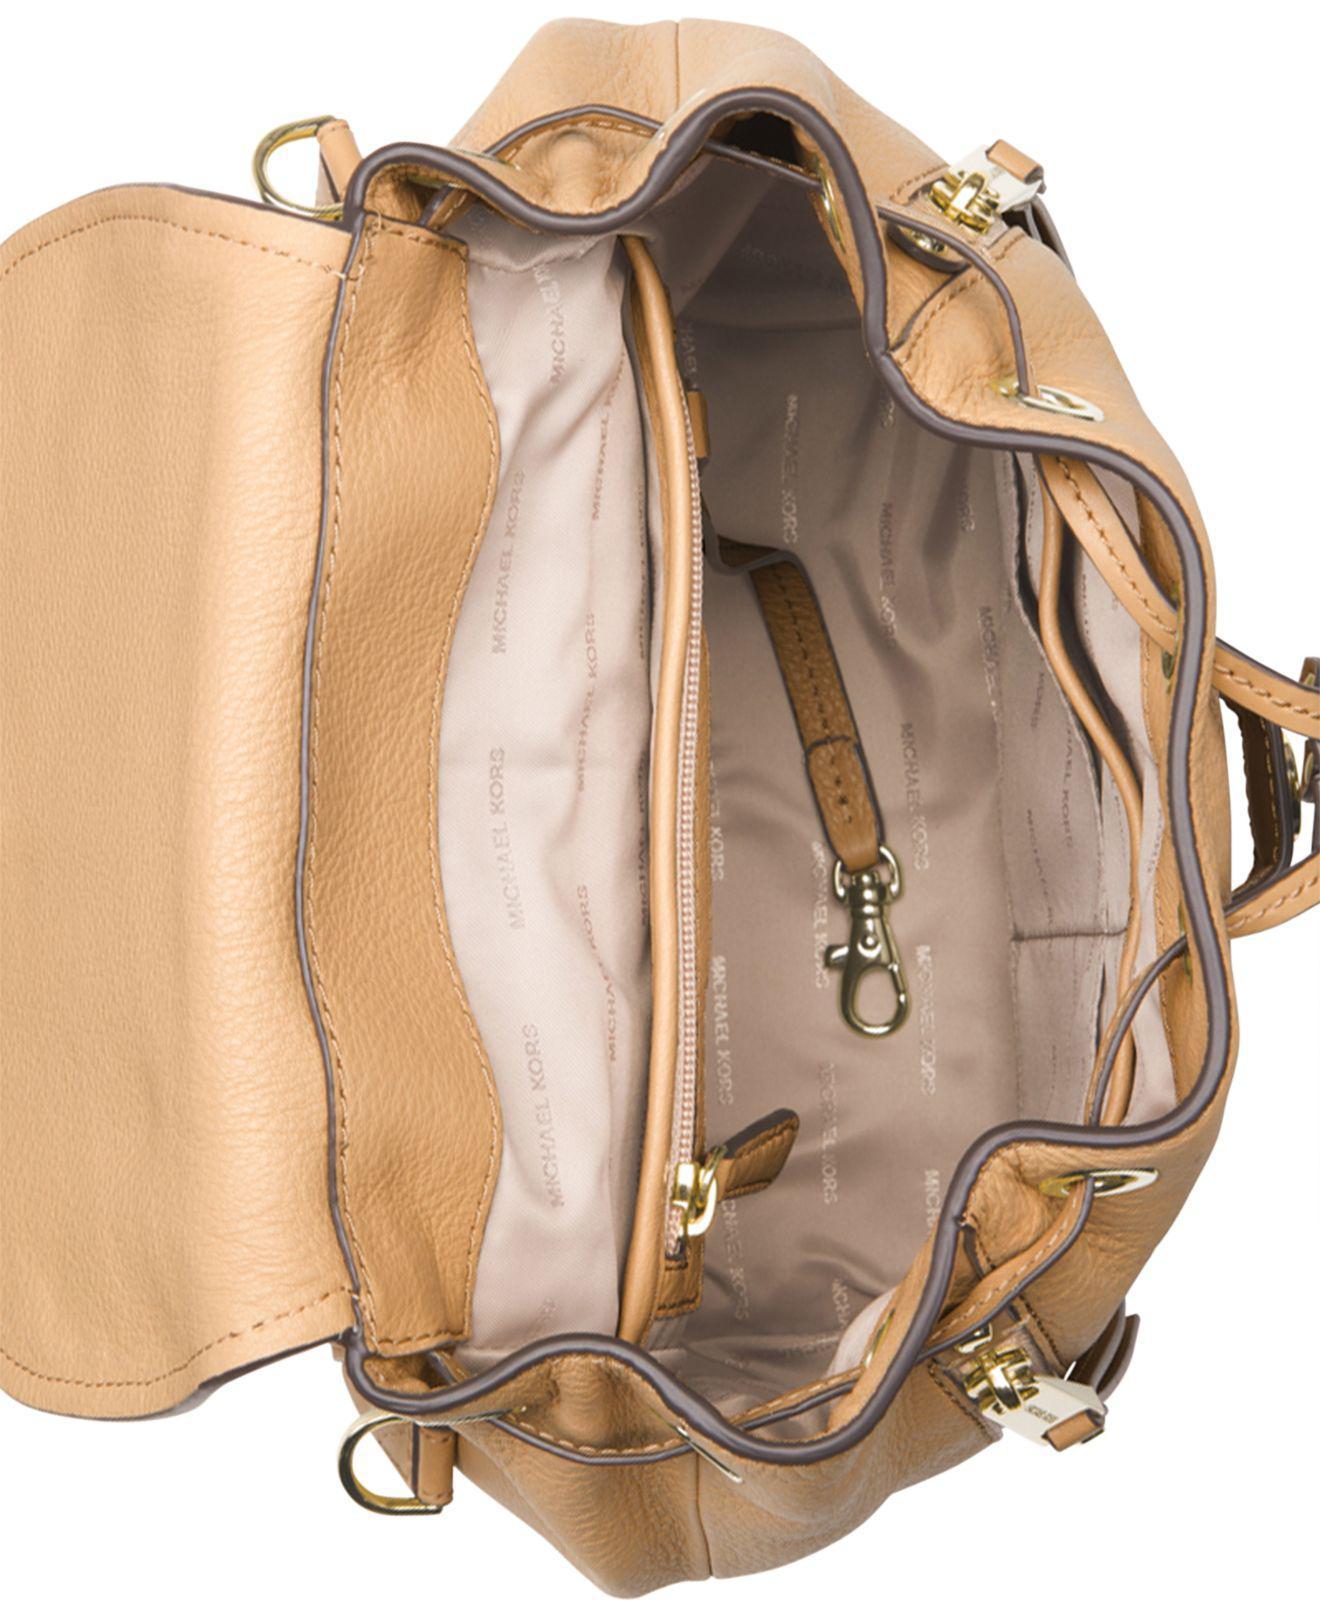 440d0b60fdd1 Michael Kors Michael Evie Small Flower Garden Backpack in Metallic ...